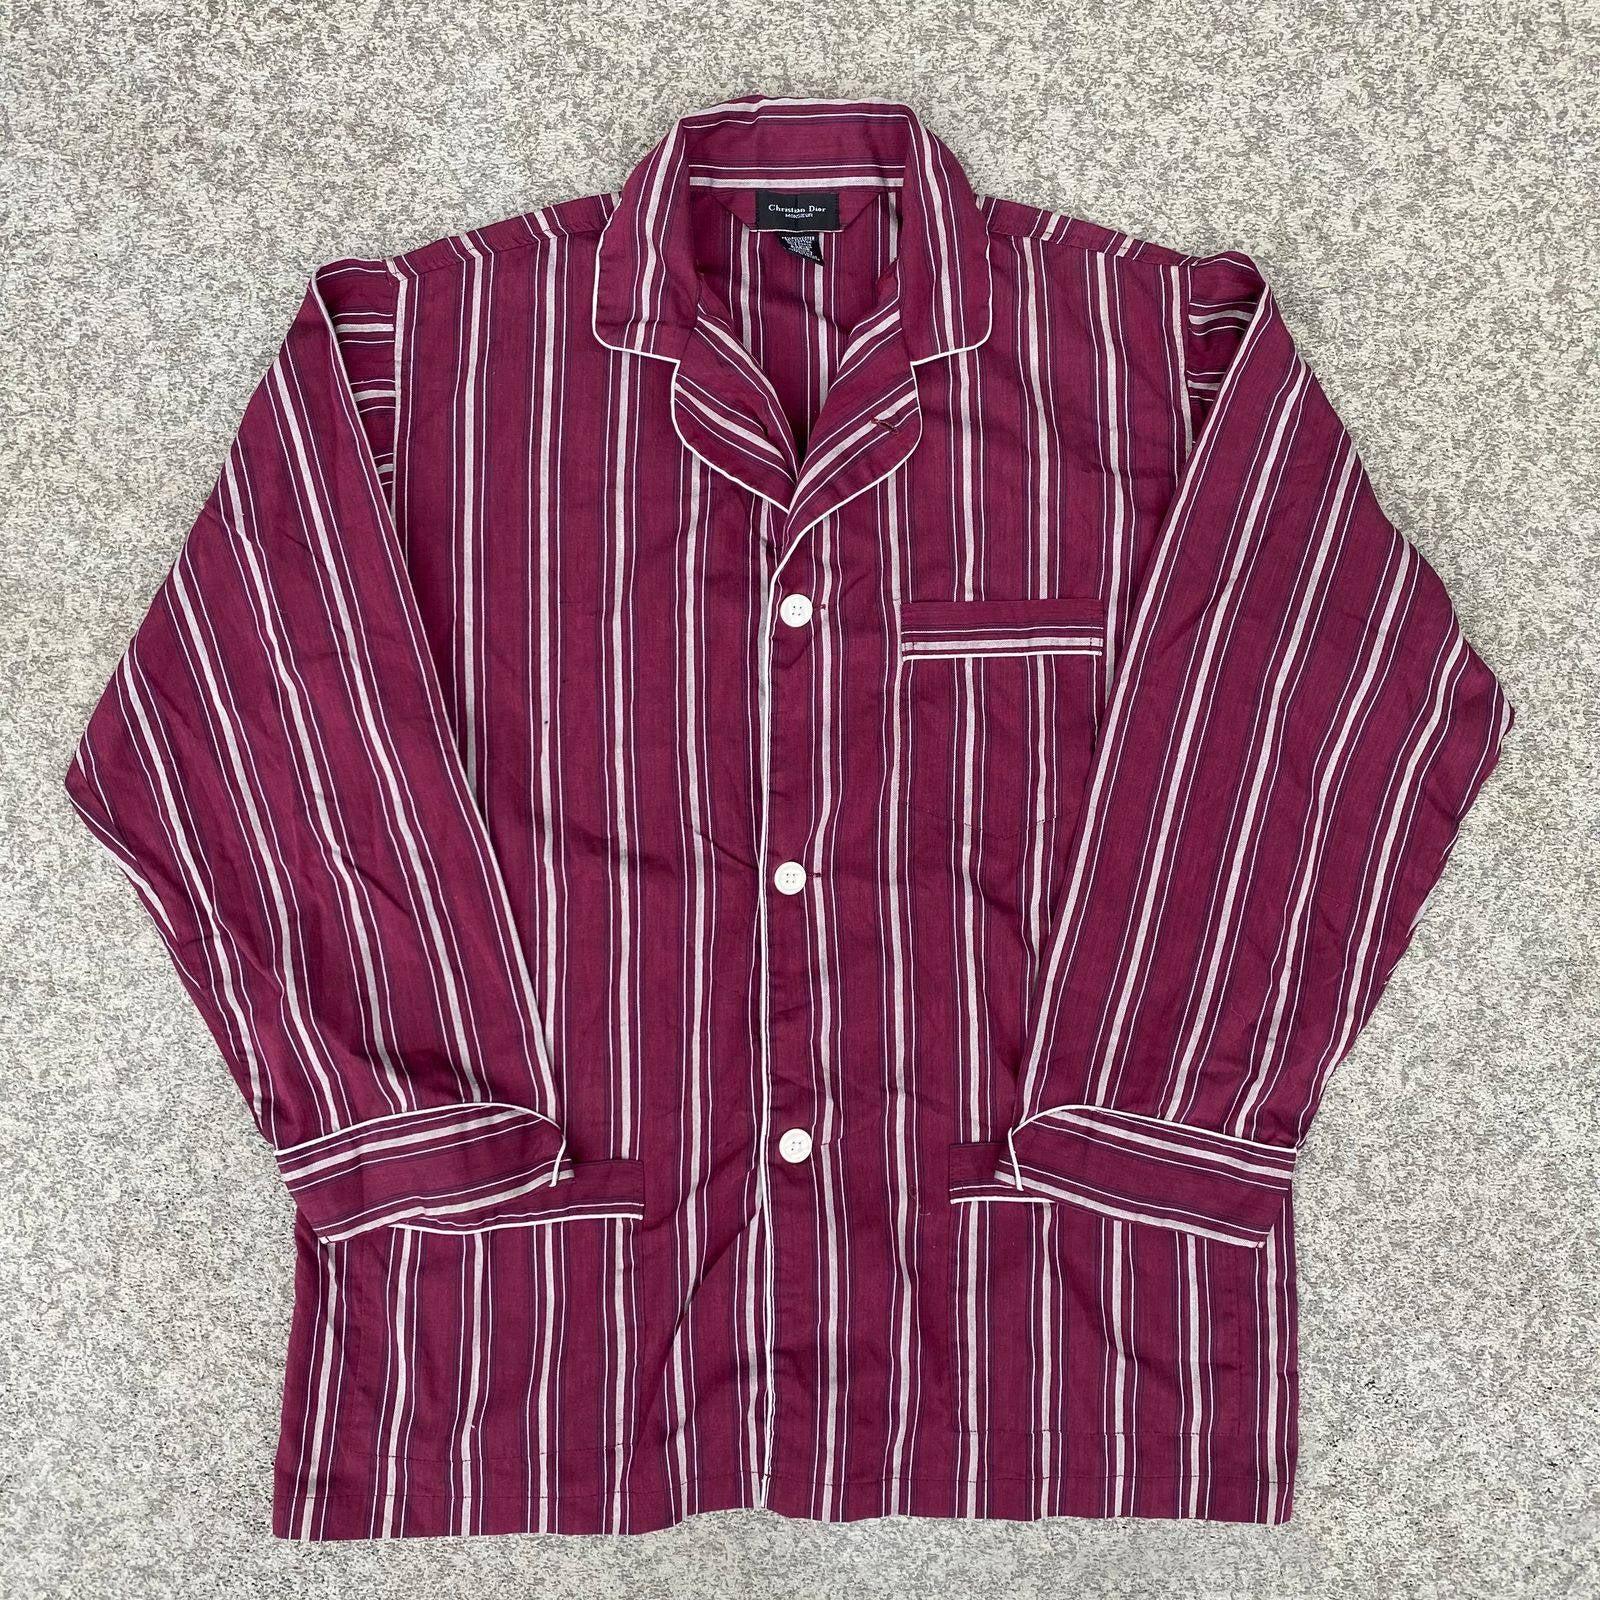 Christian Dior 1980's Pajama Shirt